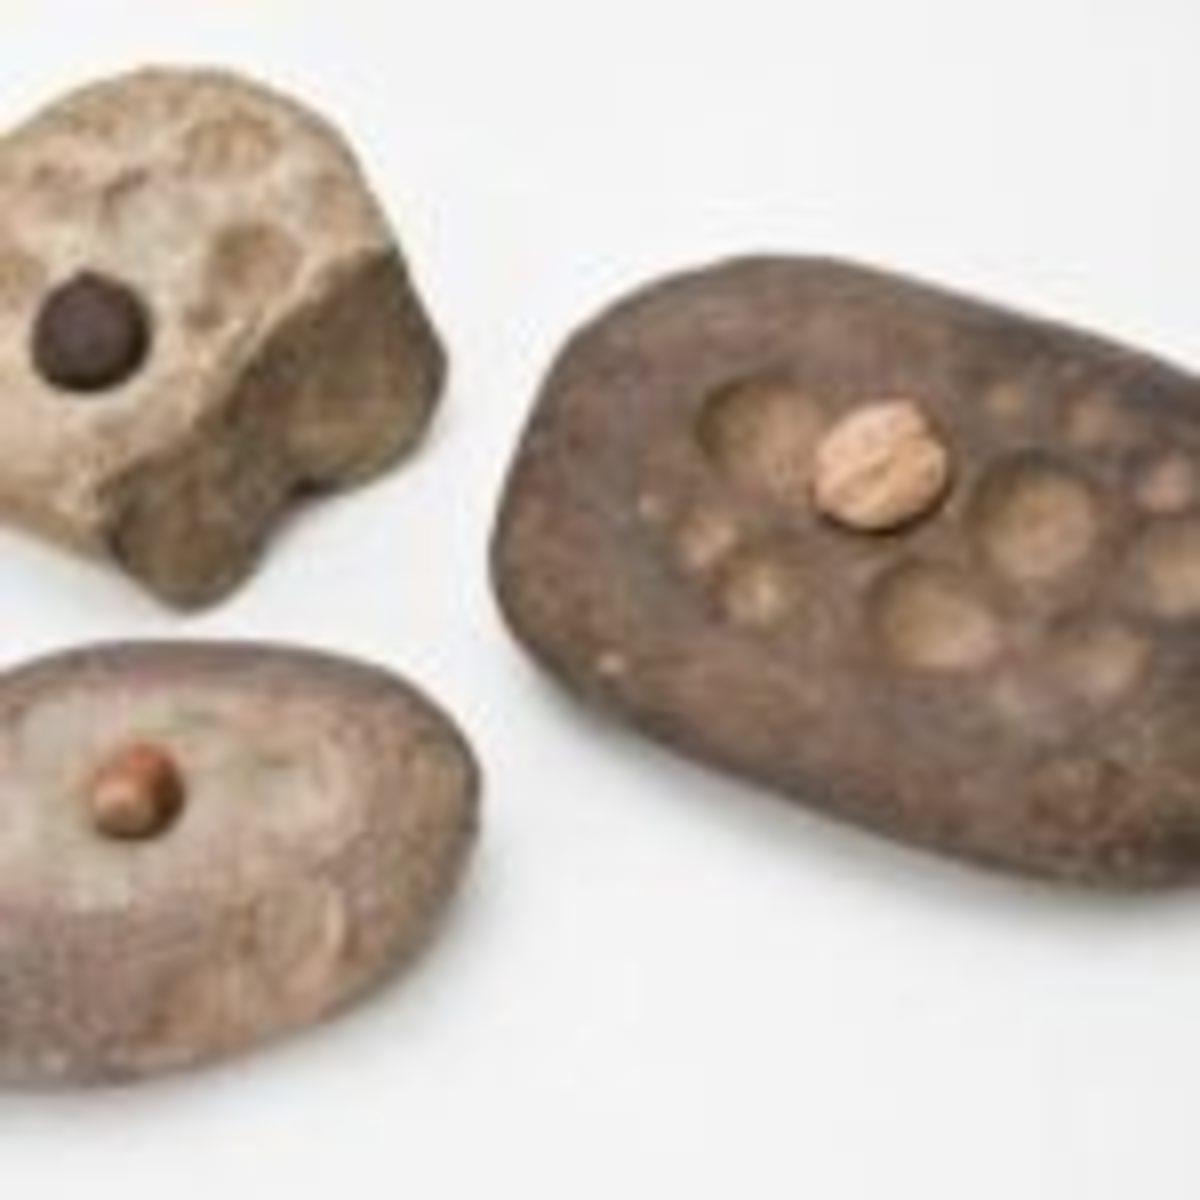 Nutting stones